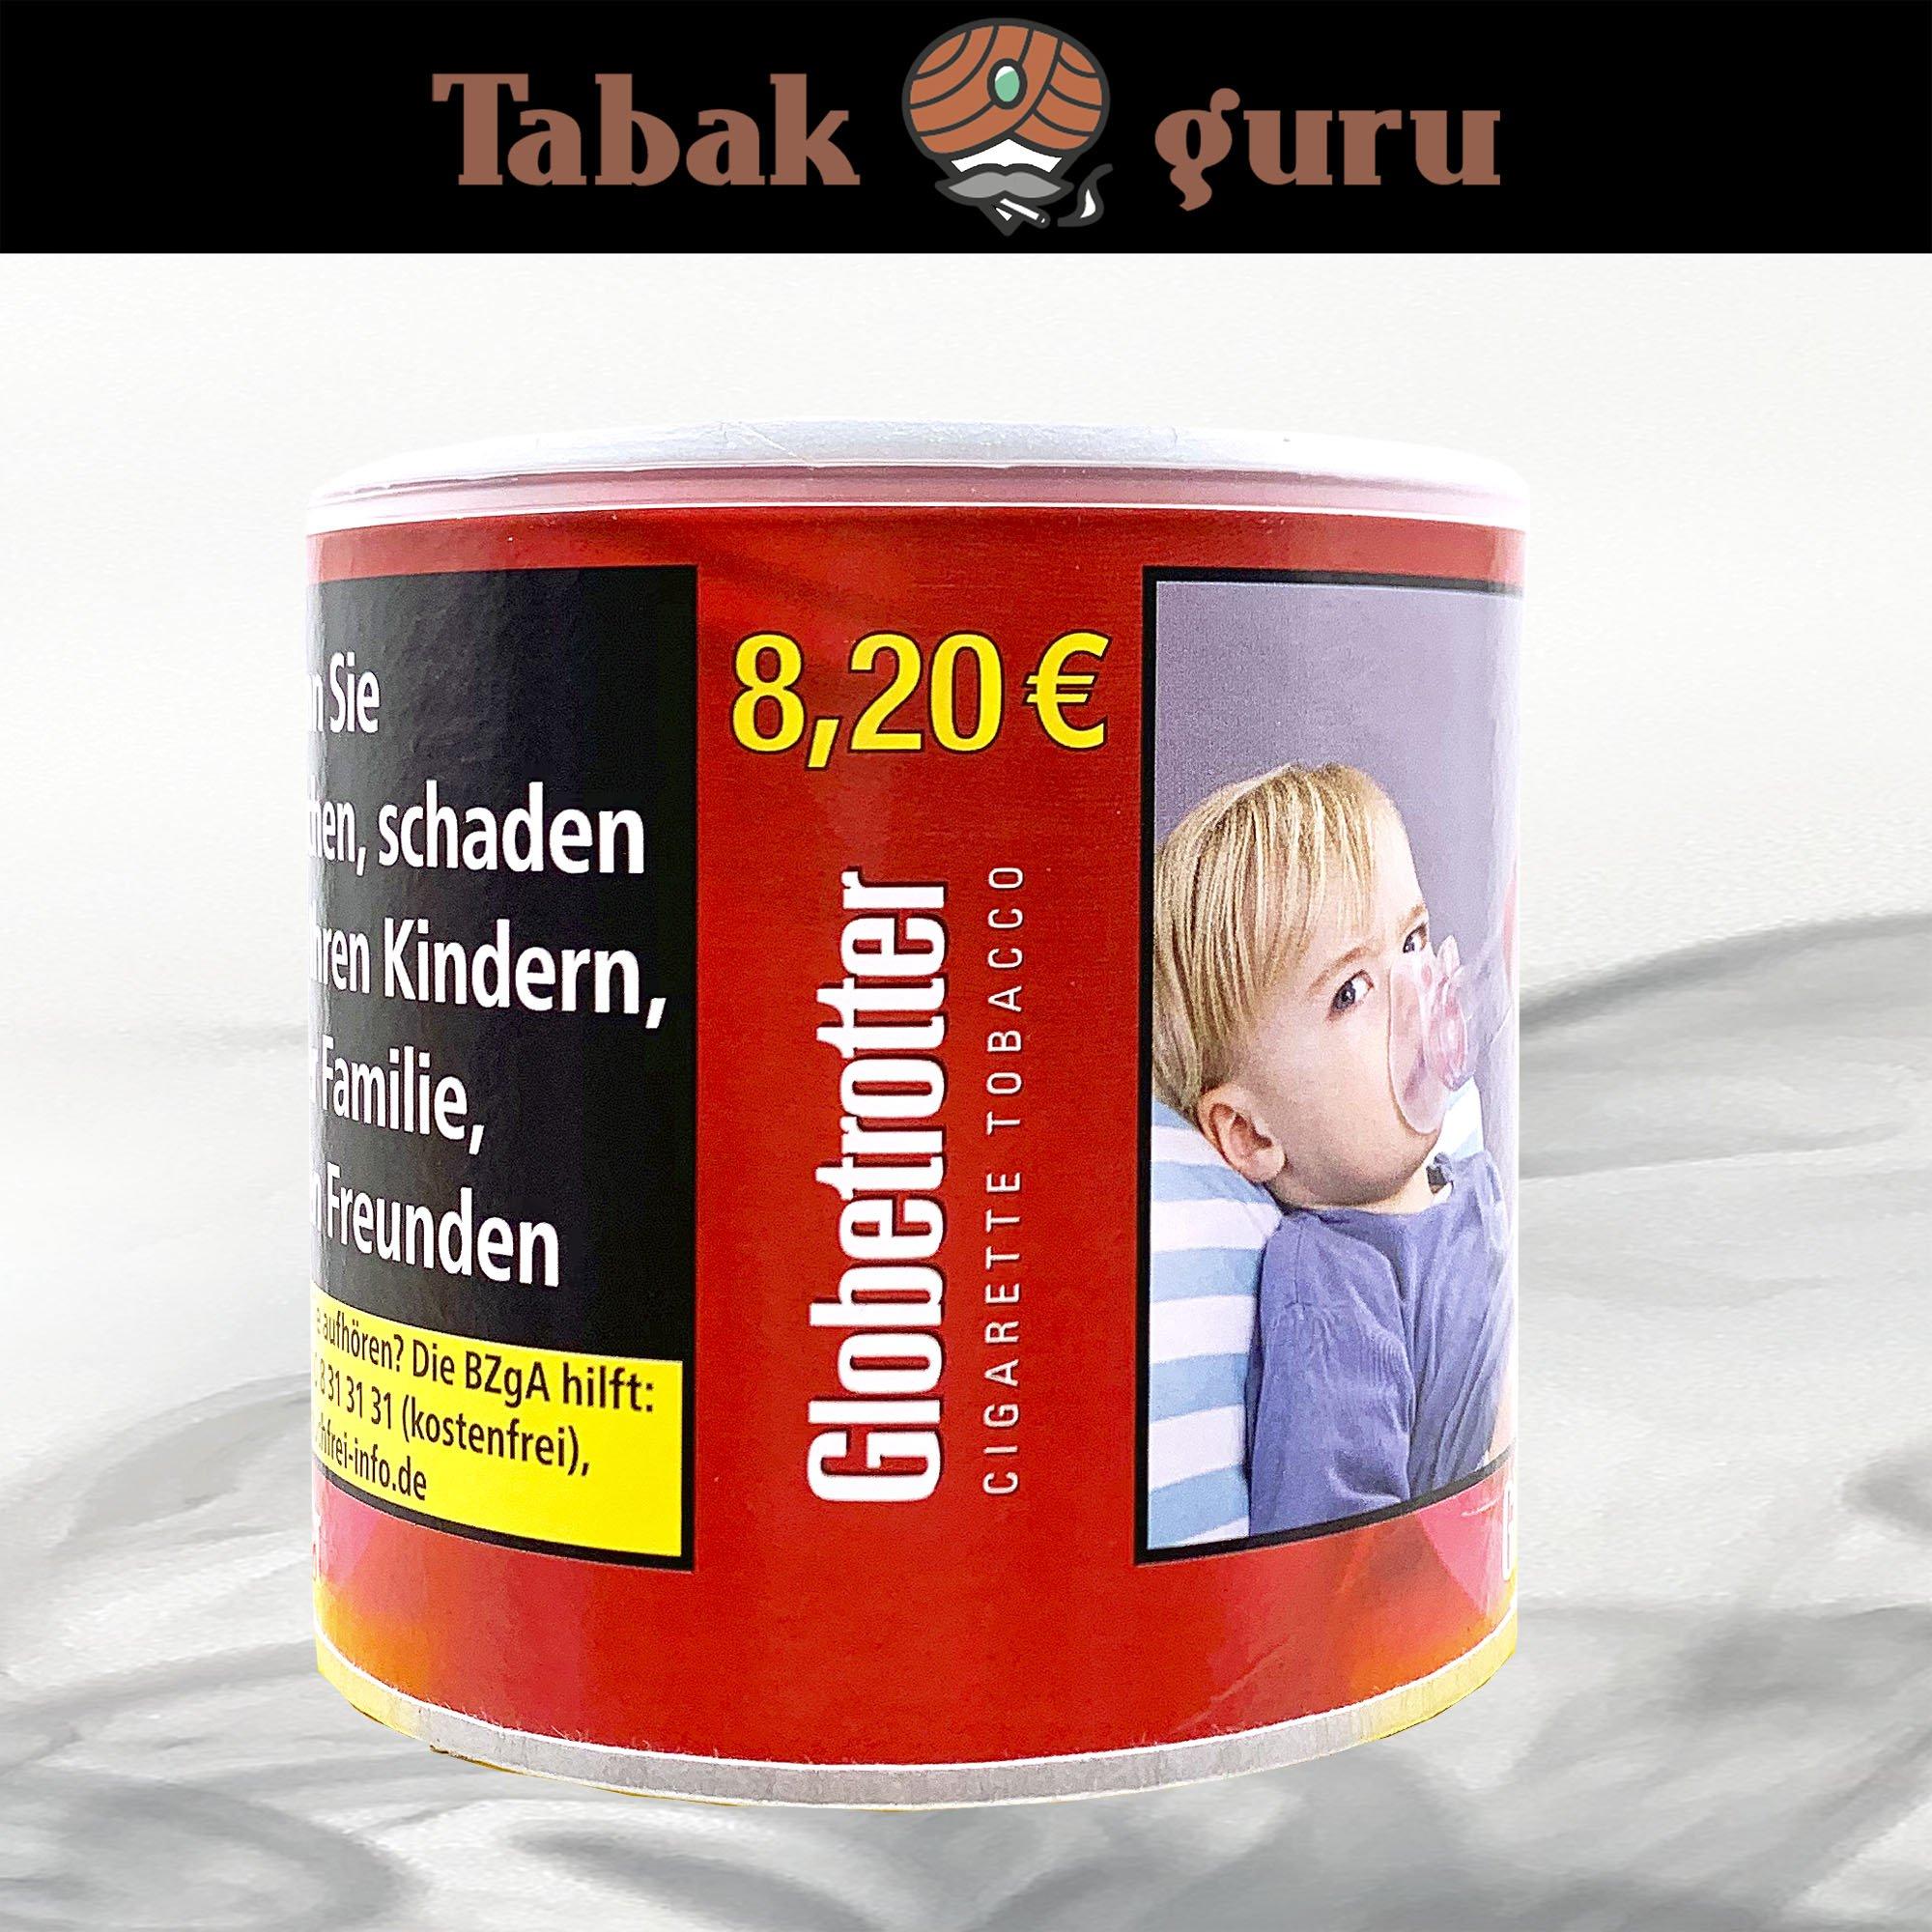 Globetrotter Red Zigarettentabak, Volumentabak, 70g Dose